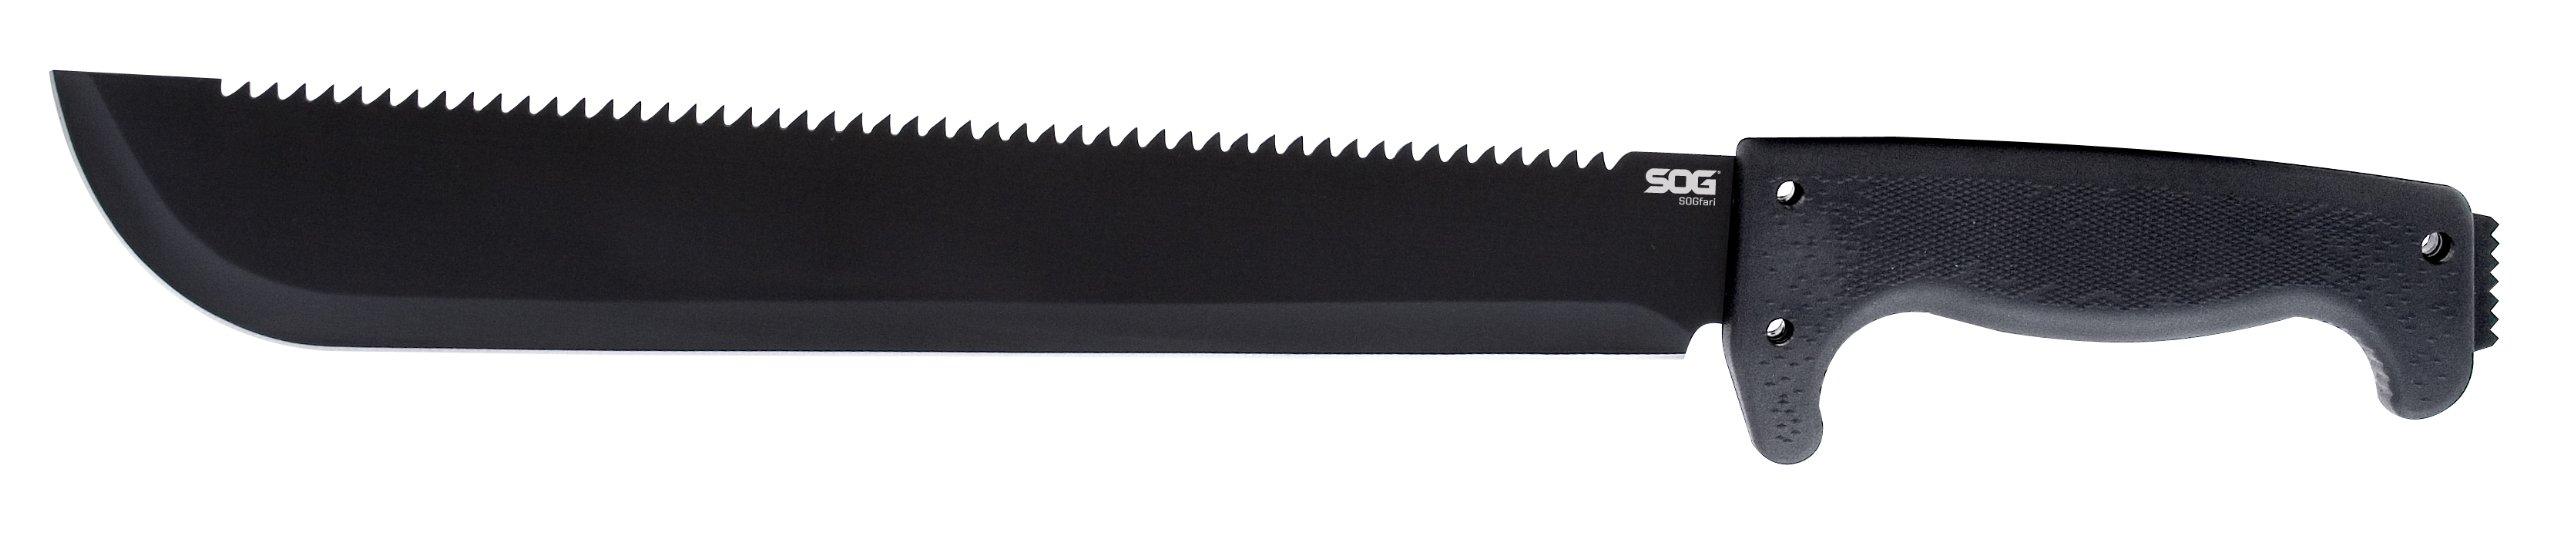 SOG SOGfari 13'''' Machete MC01-N - Hardcased Black Blade w/Saw Back, Rubber Handle, Nylon Sheath